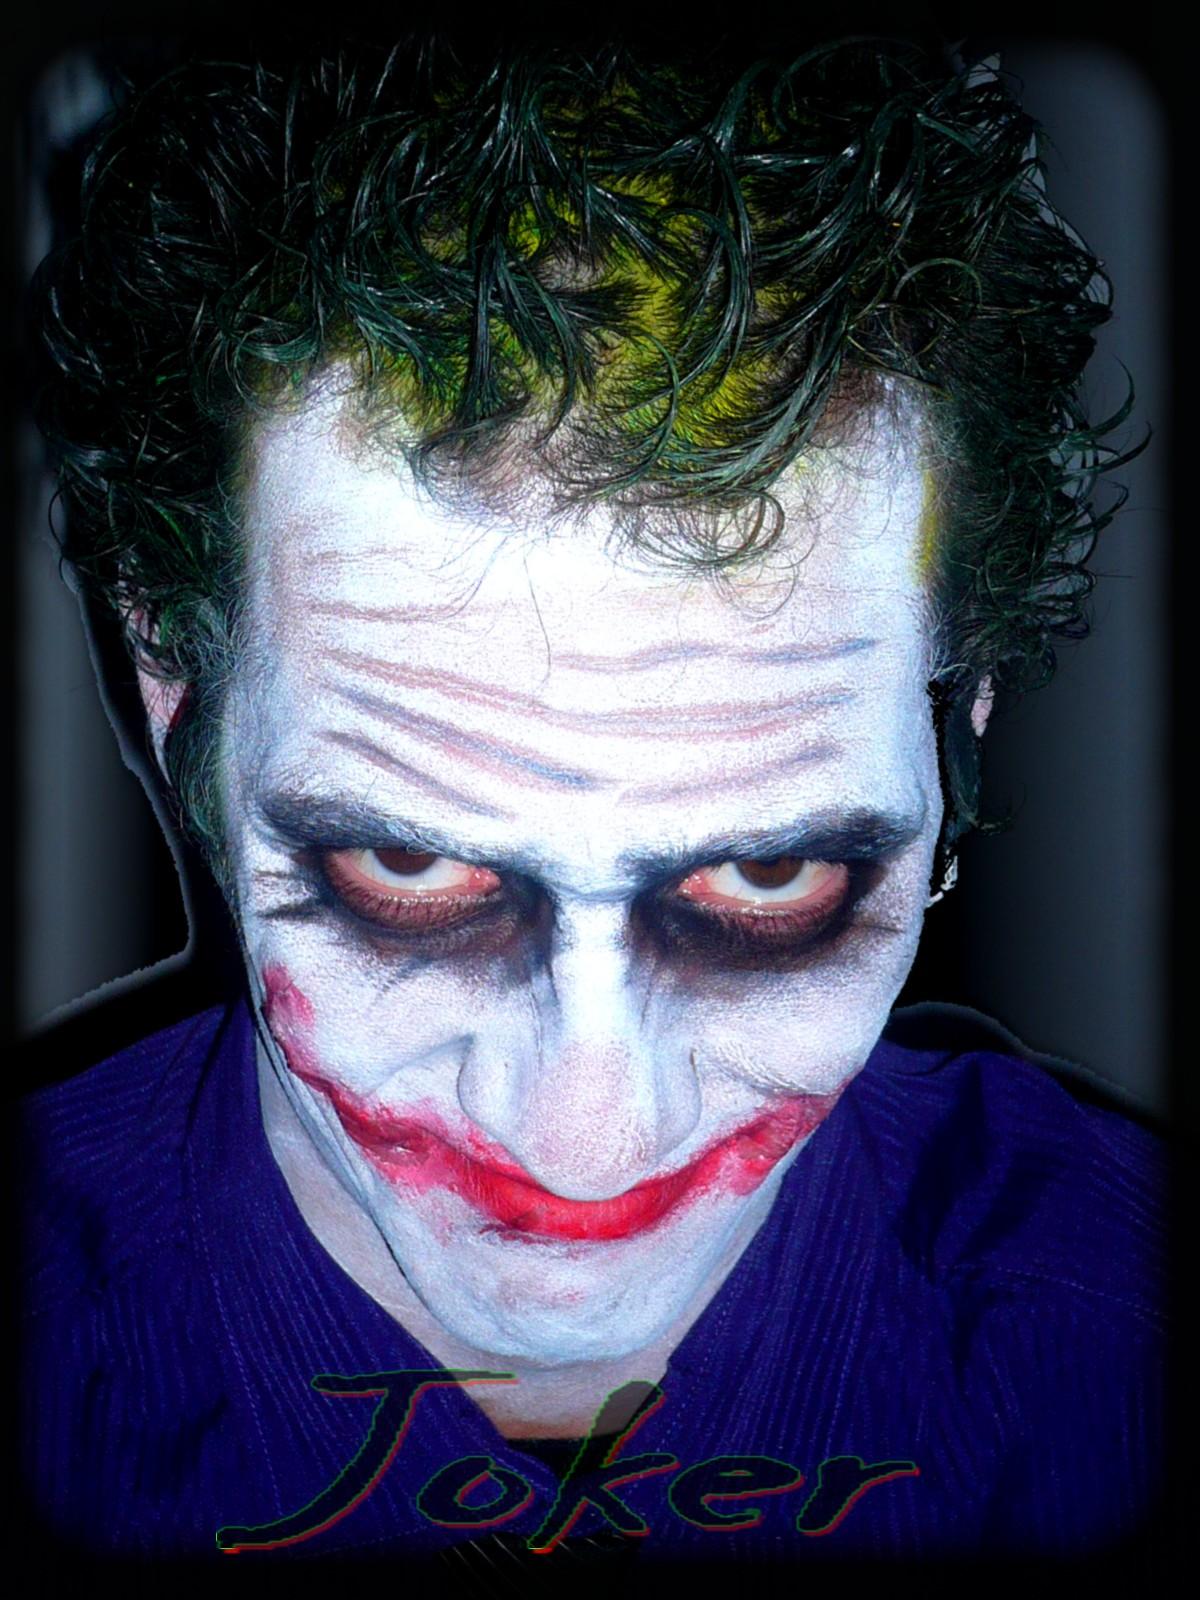 Phrase mythique du Joker dans The Dark Night (Batman)